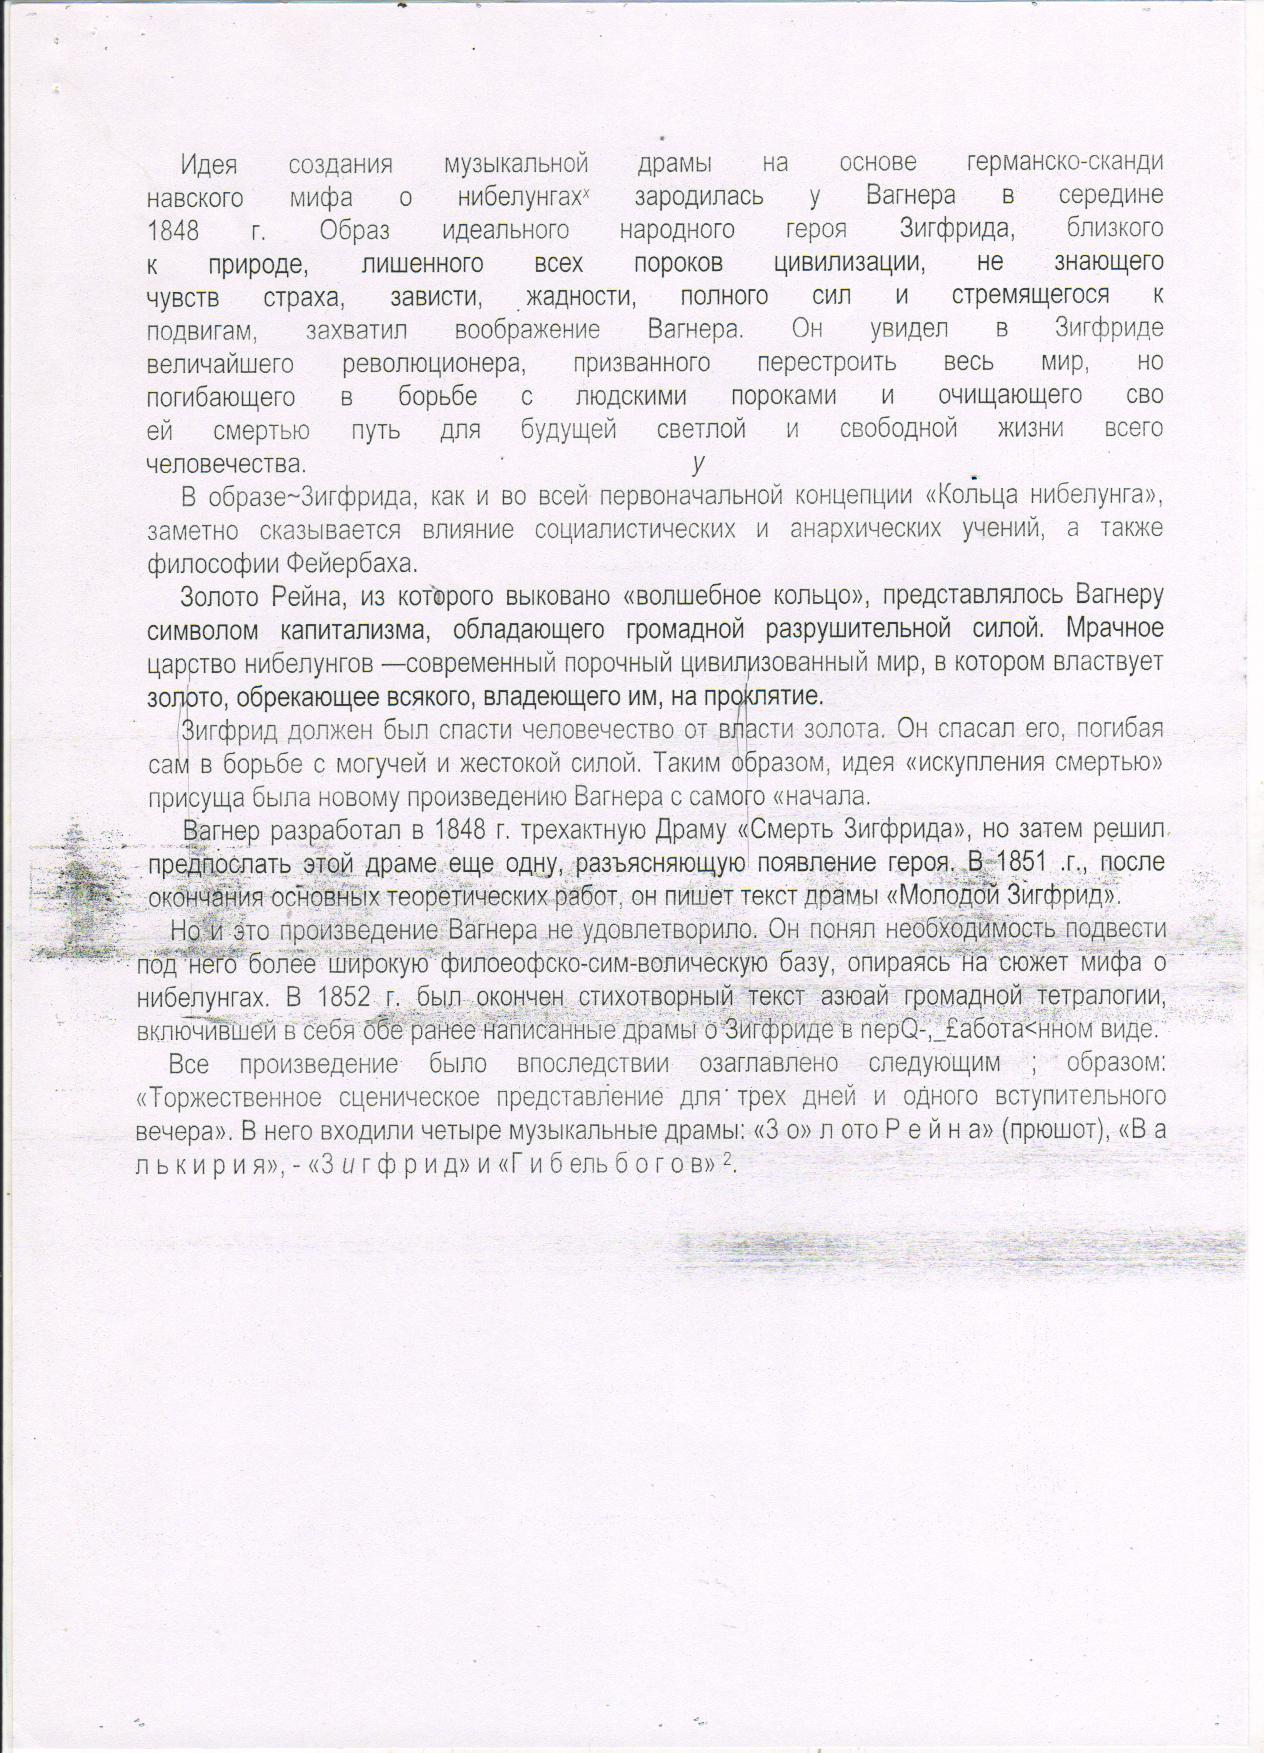 C:\Documents and Settings\Учитель\Рабочий стол\7.jpg